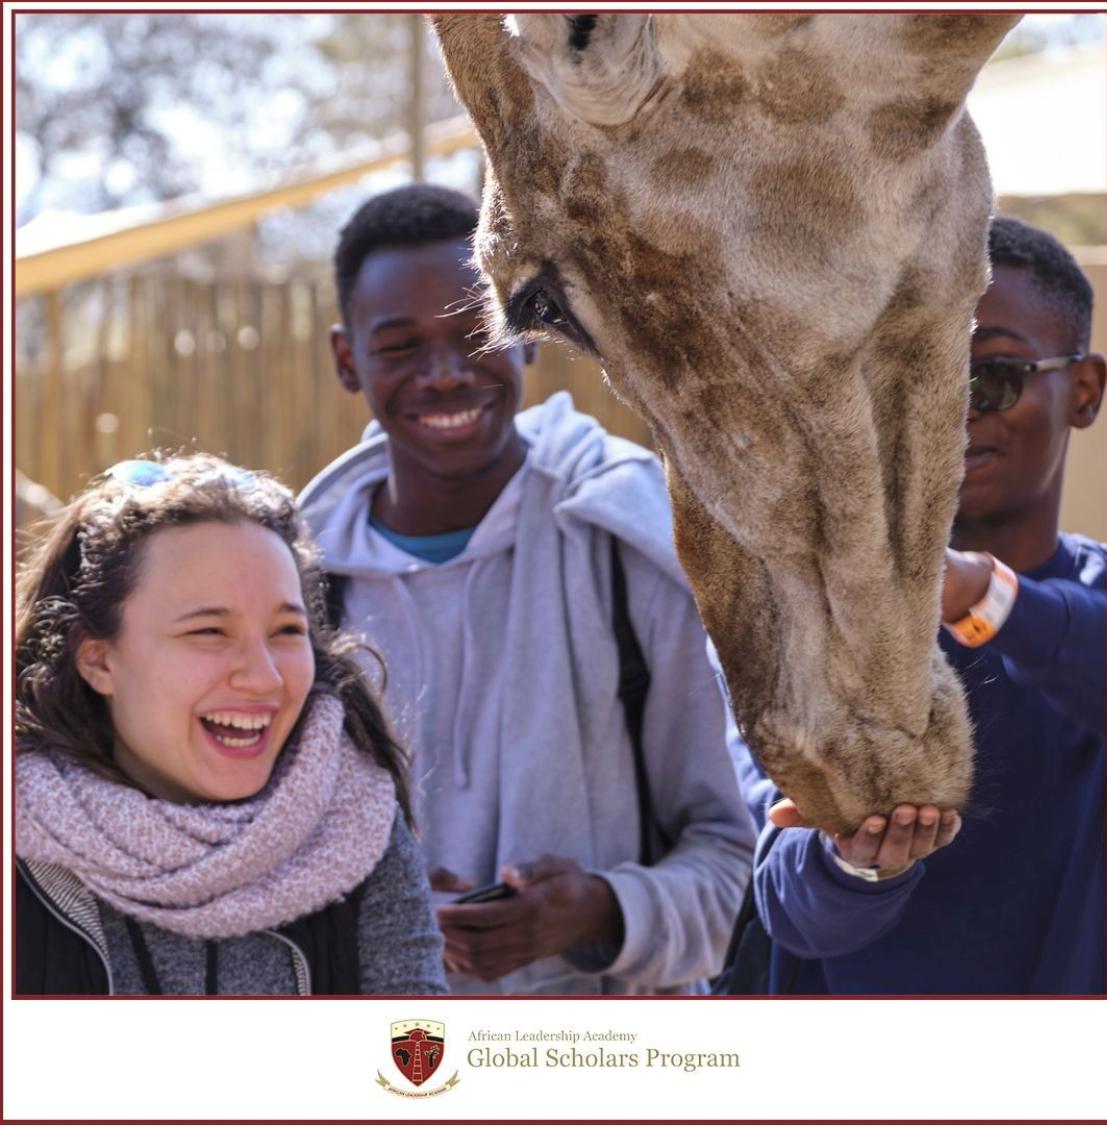 African Leadership Academy – Global Scholars Program